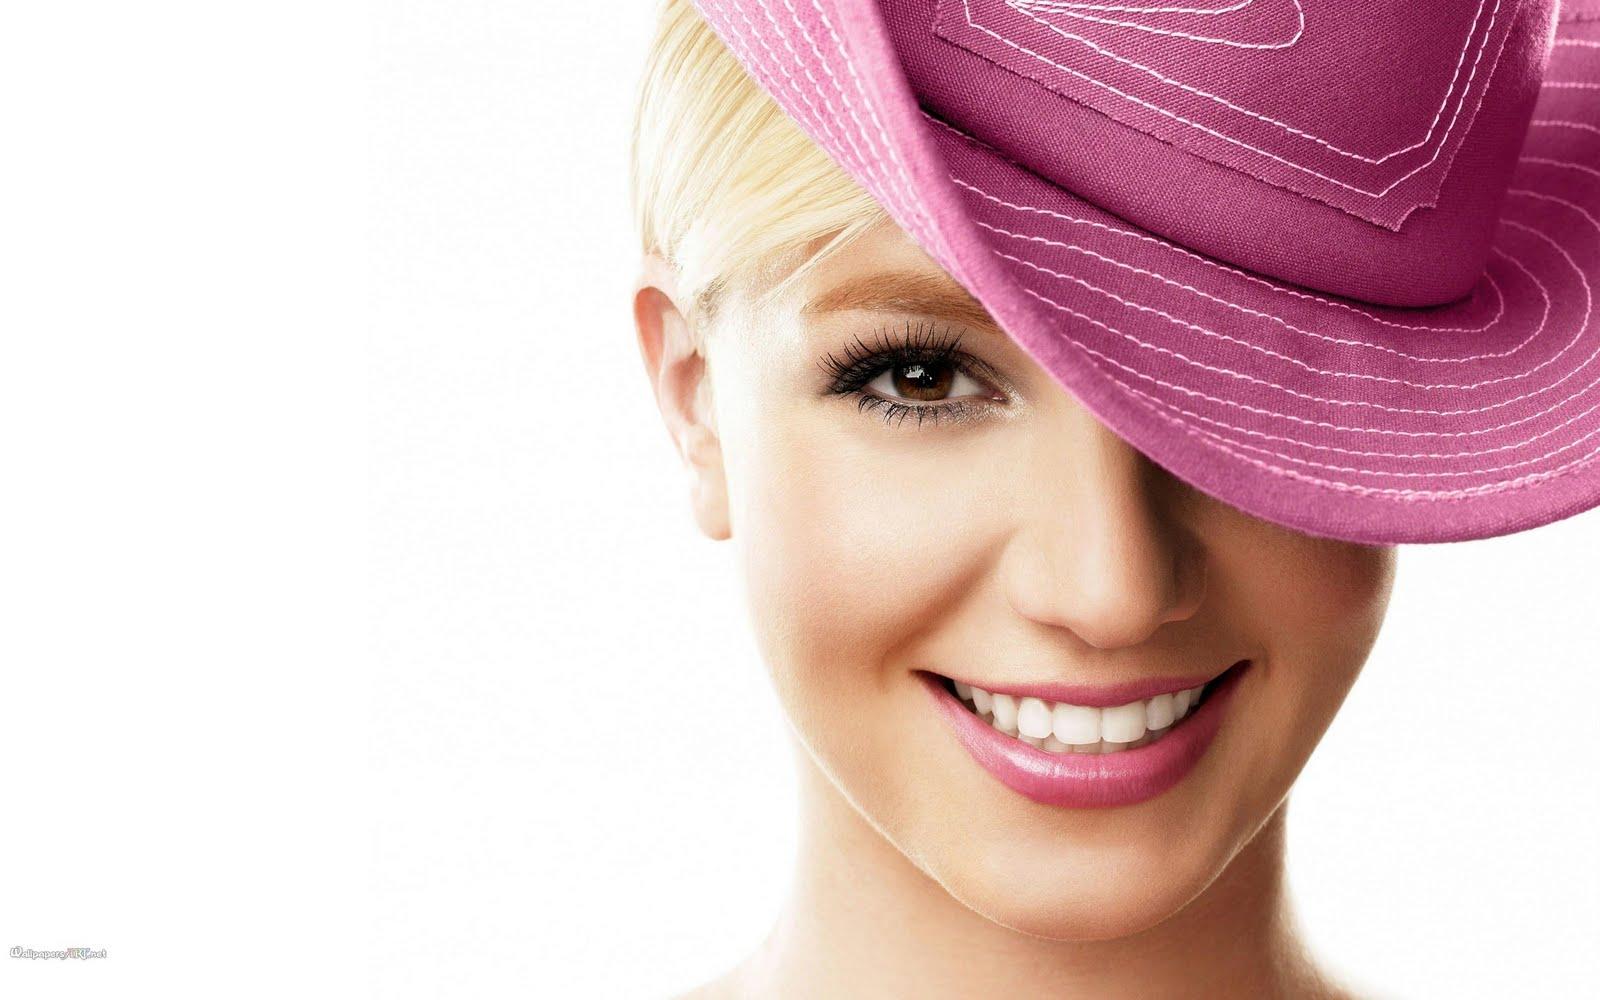 http://1.bp.blogspot.com/-Nx-dUSOBmCY/TmJQNAJGKsI/AAAAAAAACek/fI6jQLPSUC0/s1600/Britney+Spears+2011+Wallpaper.jpg